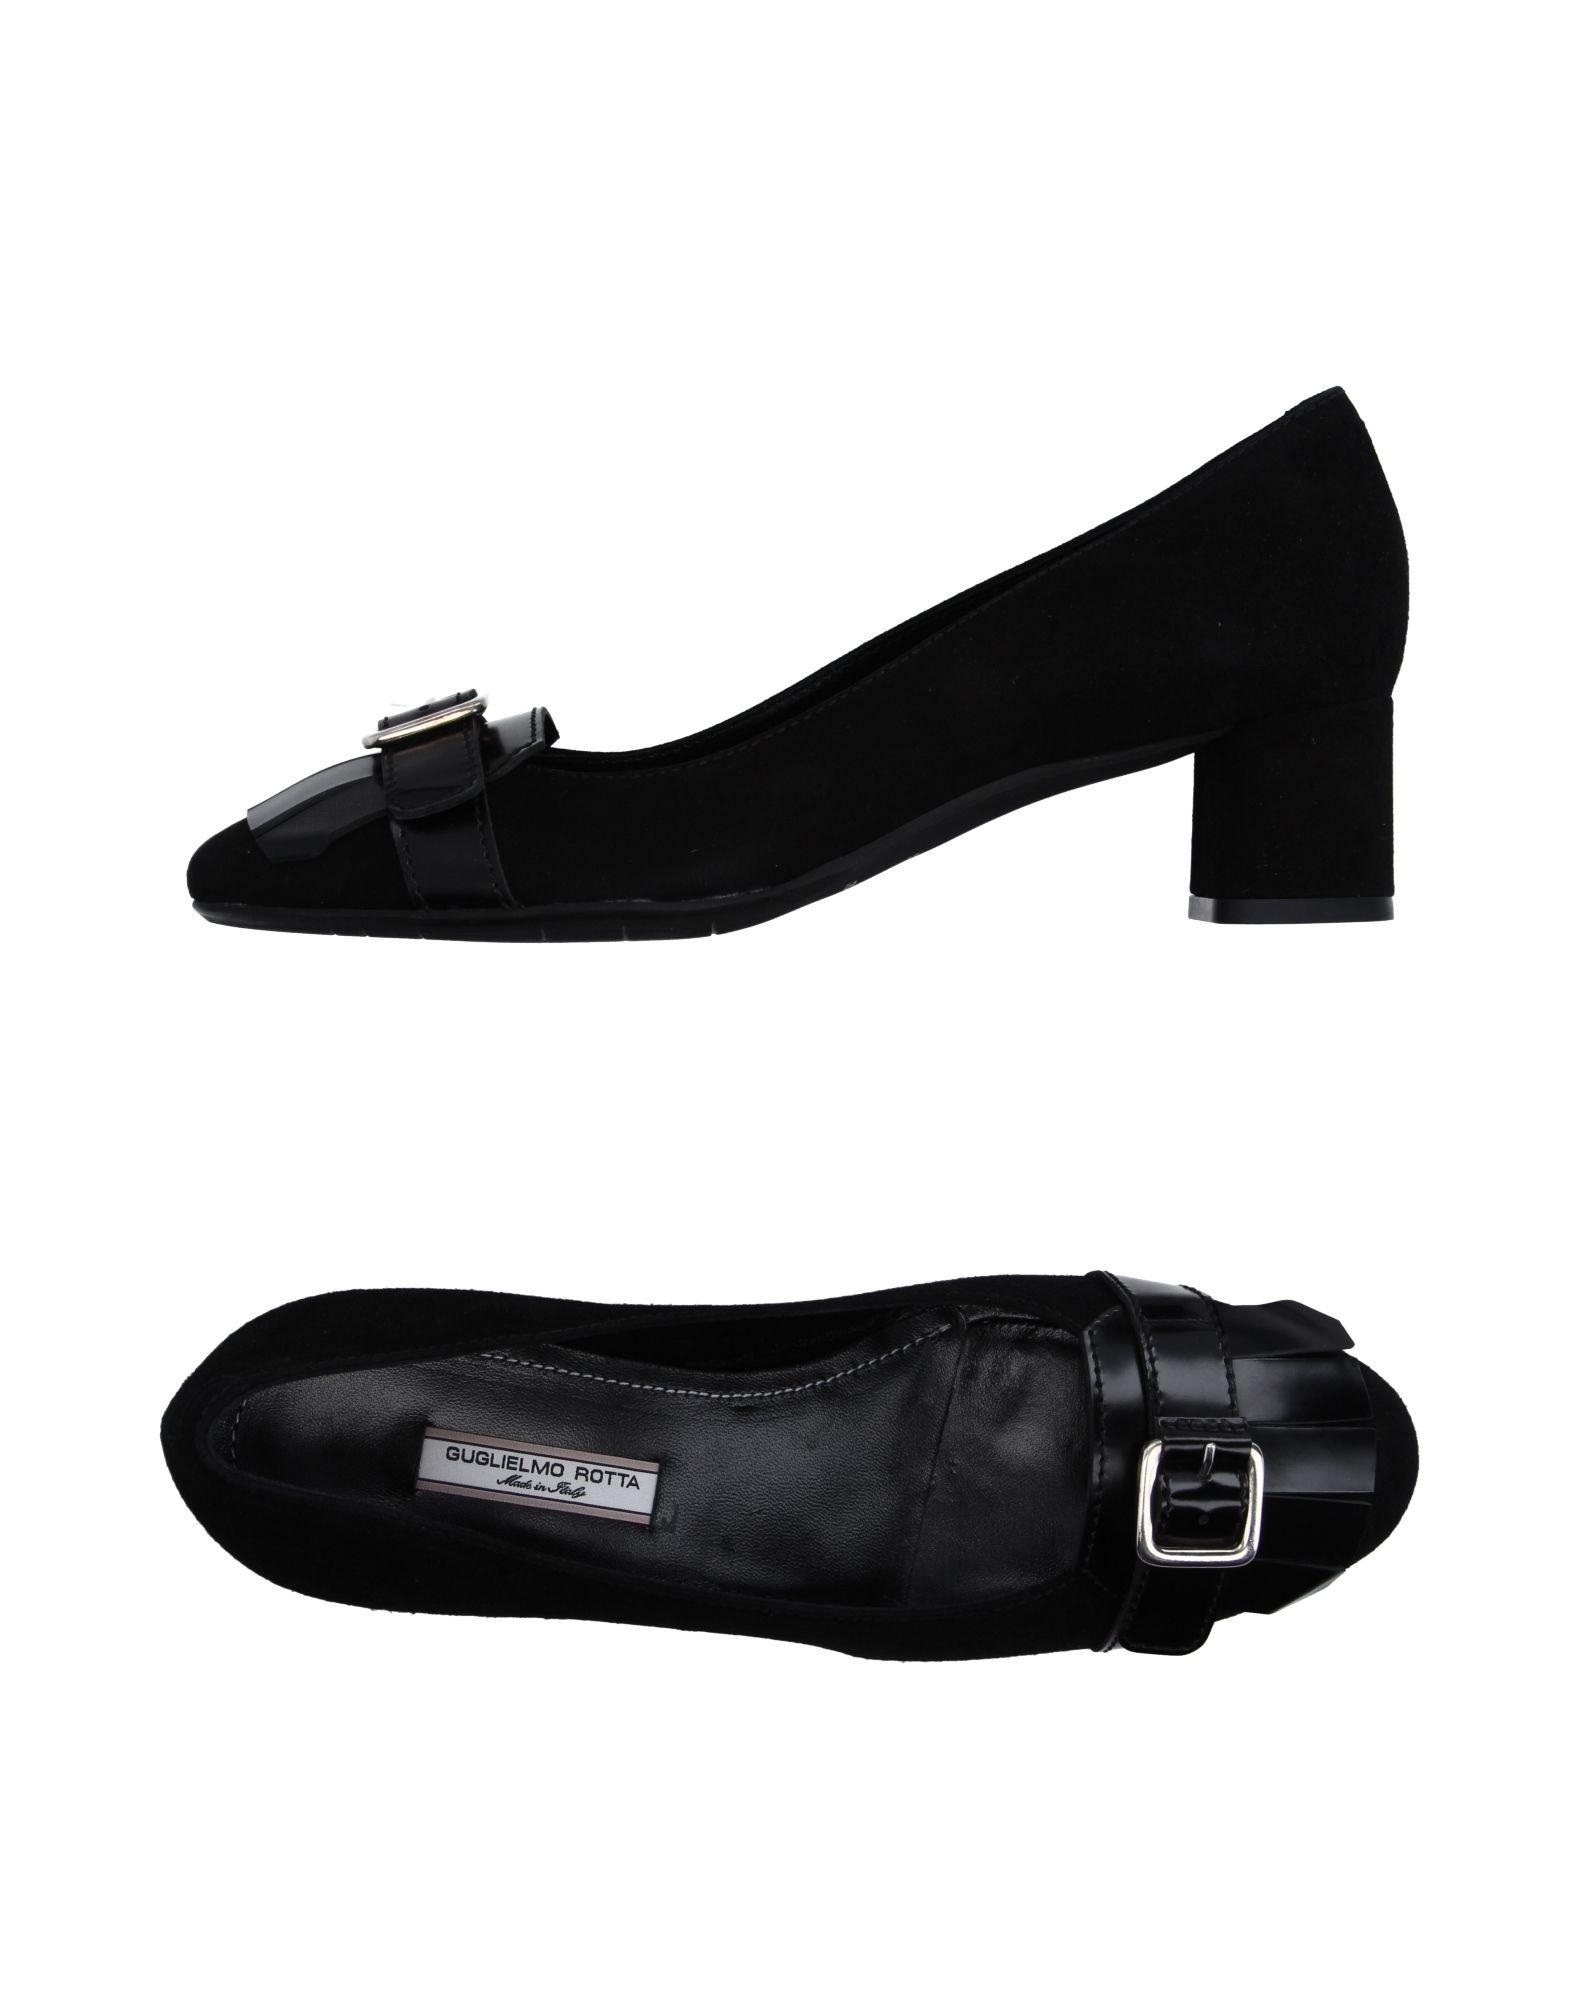 Guglielmo 11163195PJ Rotta Mokassins Damen  11163195PJ Guglielmo Gute Qualität beliebte Schuhe 80d611